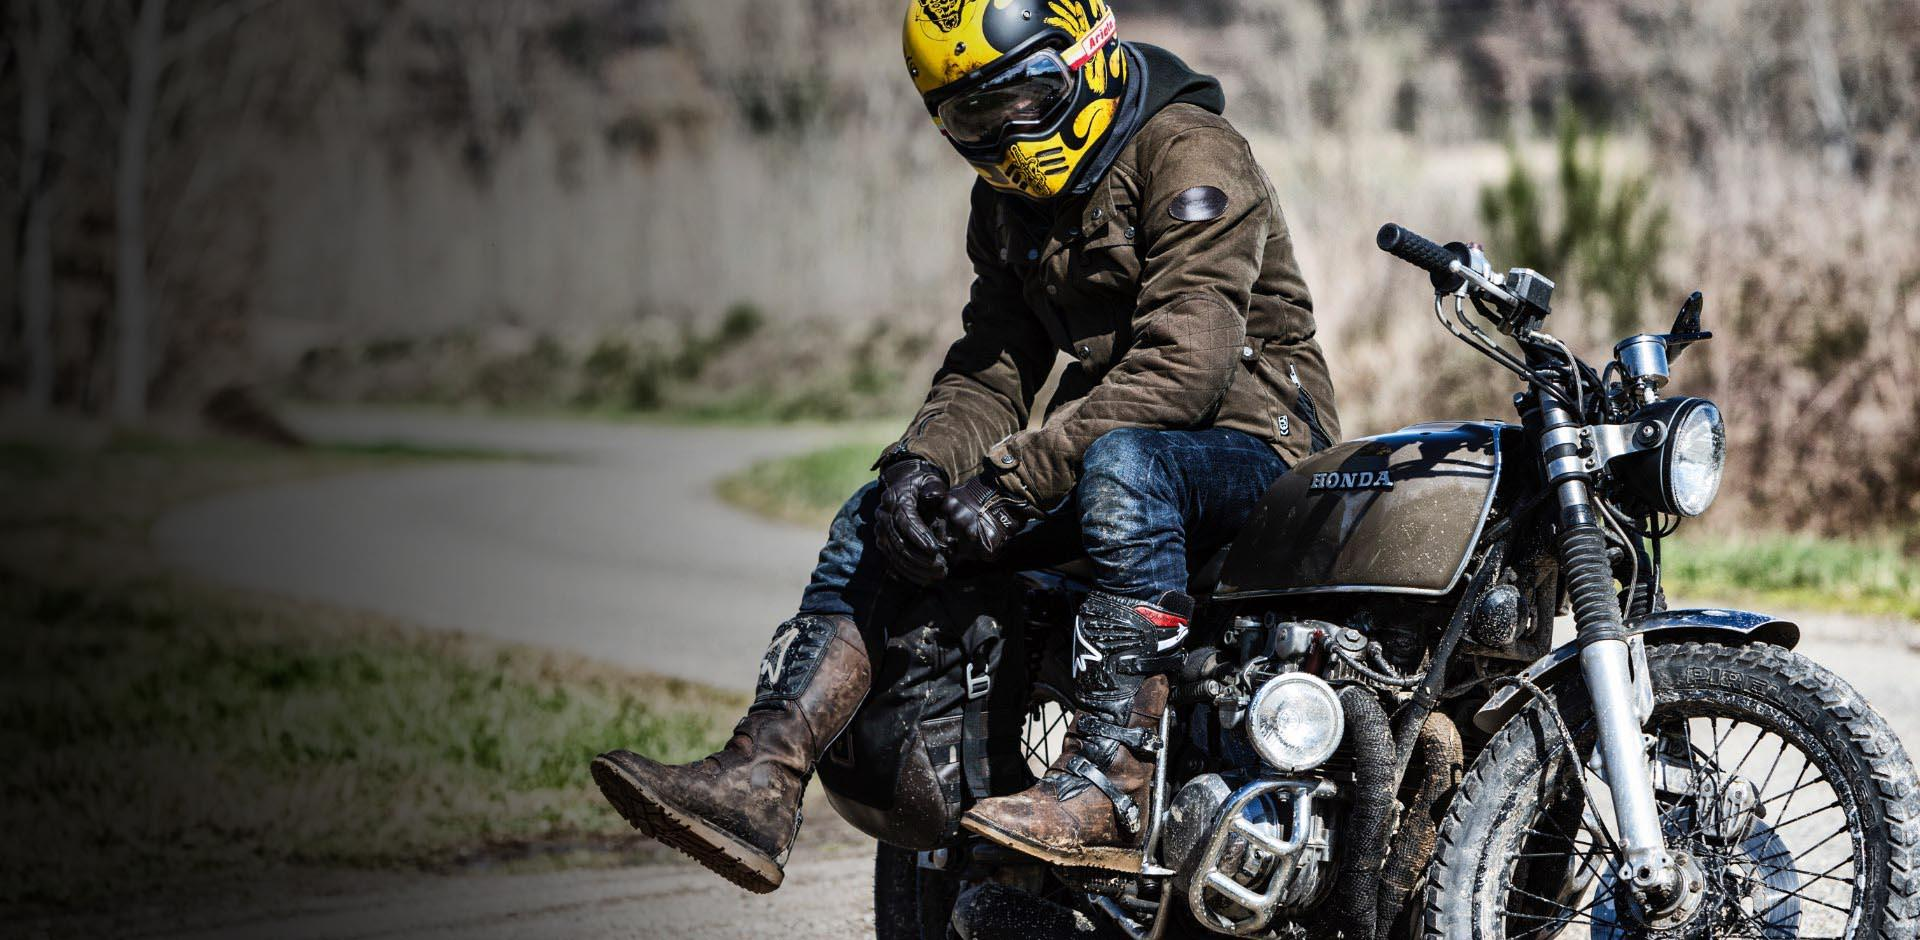 Stivali Moto Invernali | Stylmartin Shop Online